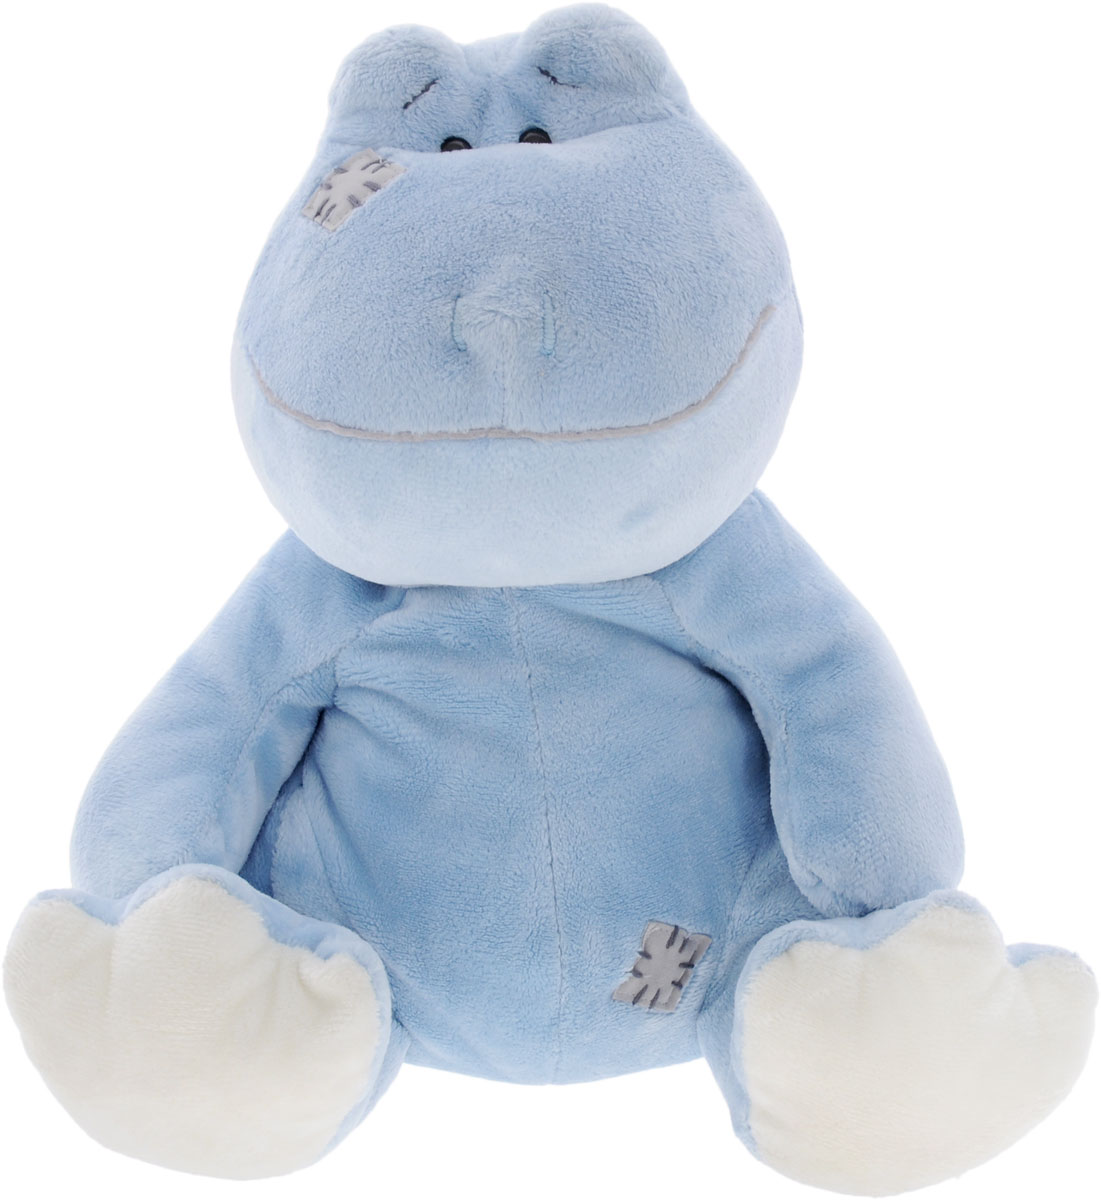 Me to You Мягкая игрушка Лягушка 25 см футболка для беременных printio мишка me to you